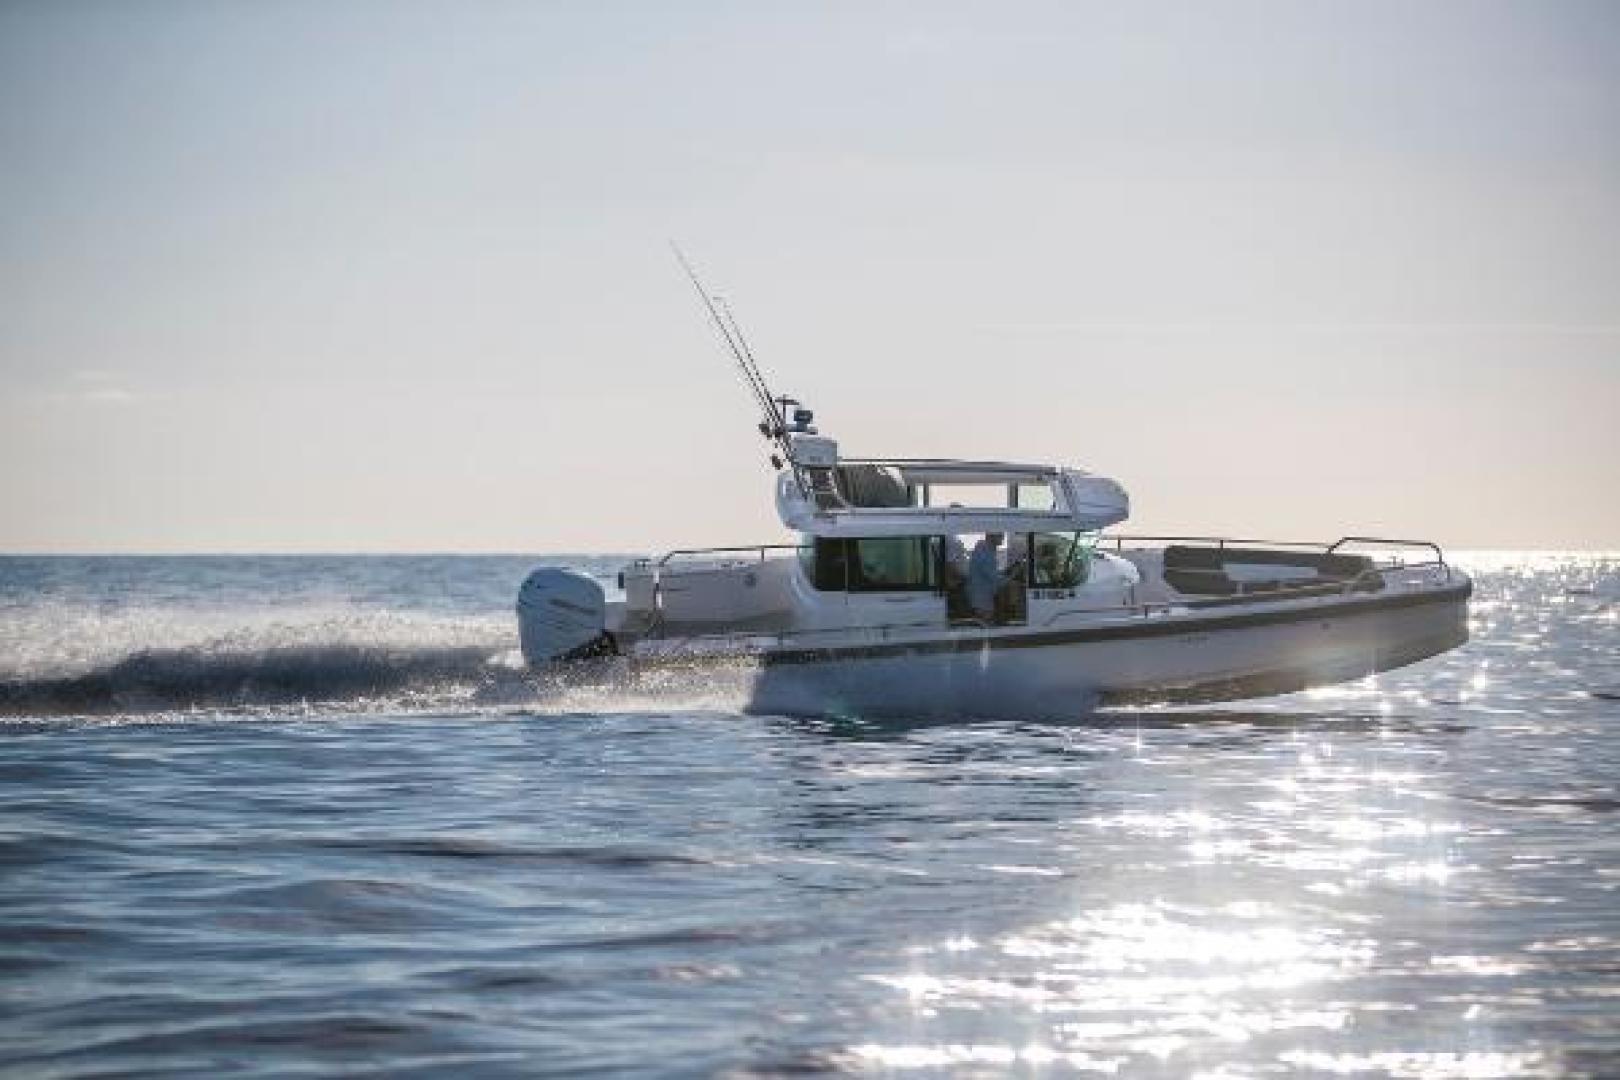 Axopar-28 CABIN 2020-Axopar 28 CABIN Sarasota-Florida-United States-1531399 | Thumbnail